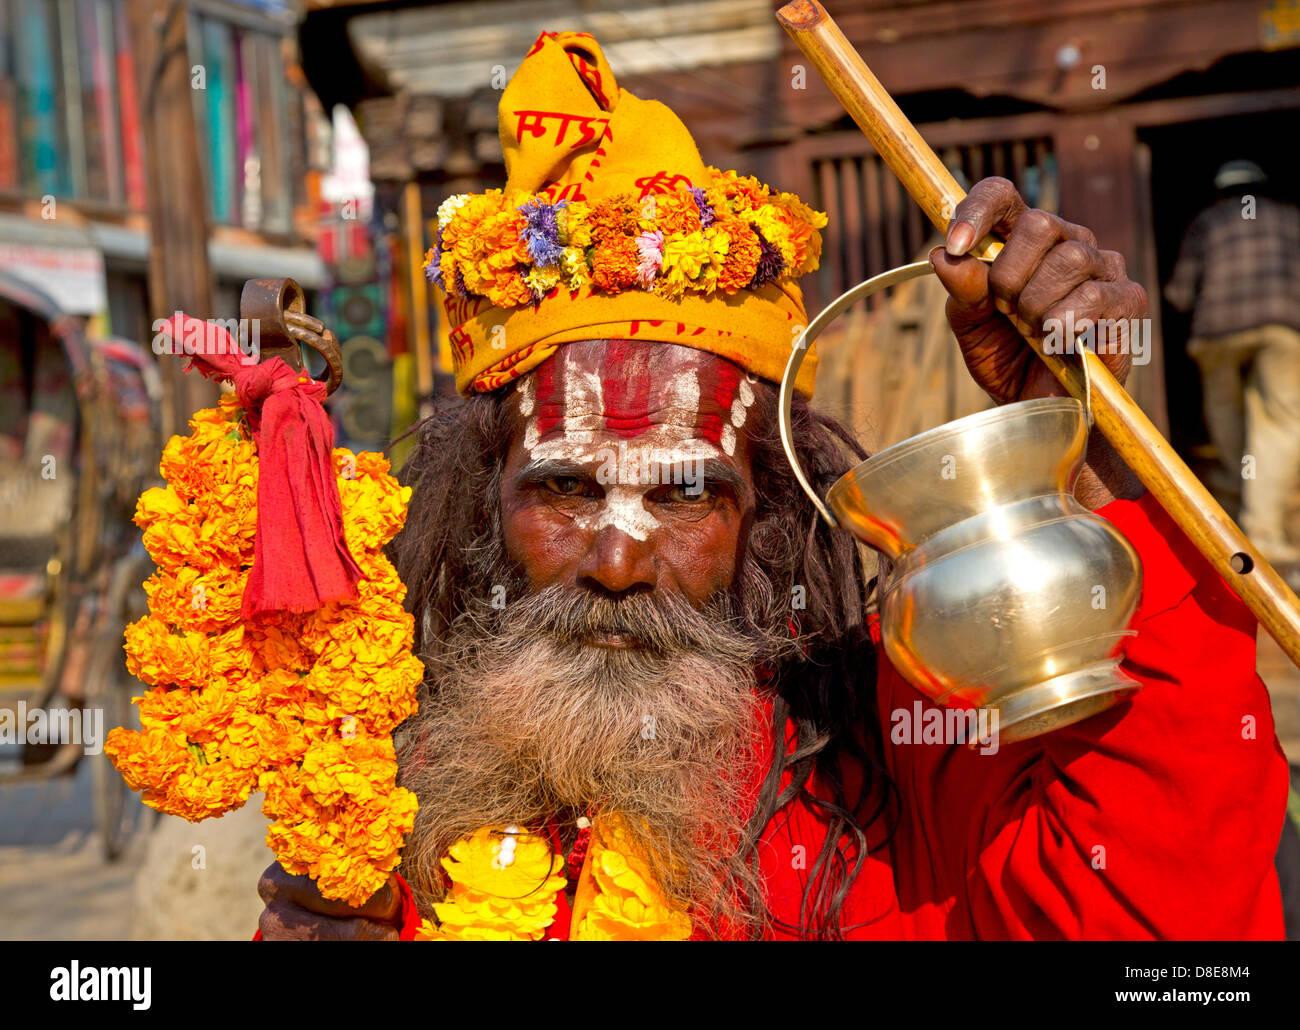 Sadhu, Durbar Square, Kathmandu, Nepal, Asia - Stock Image